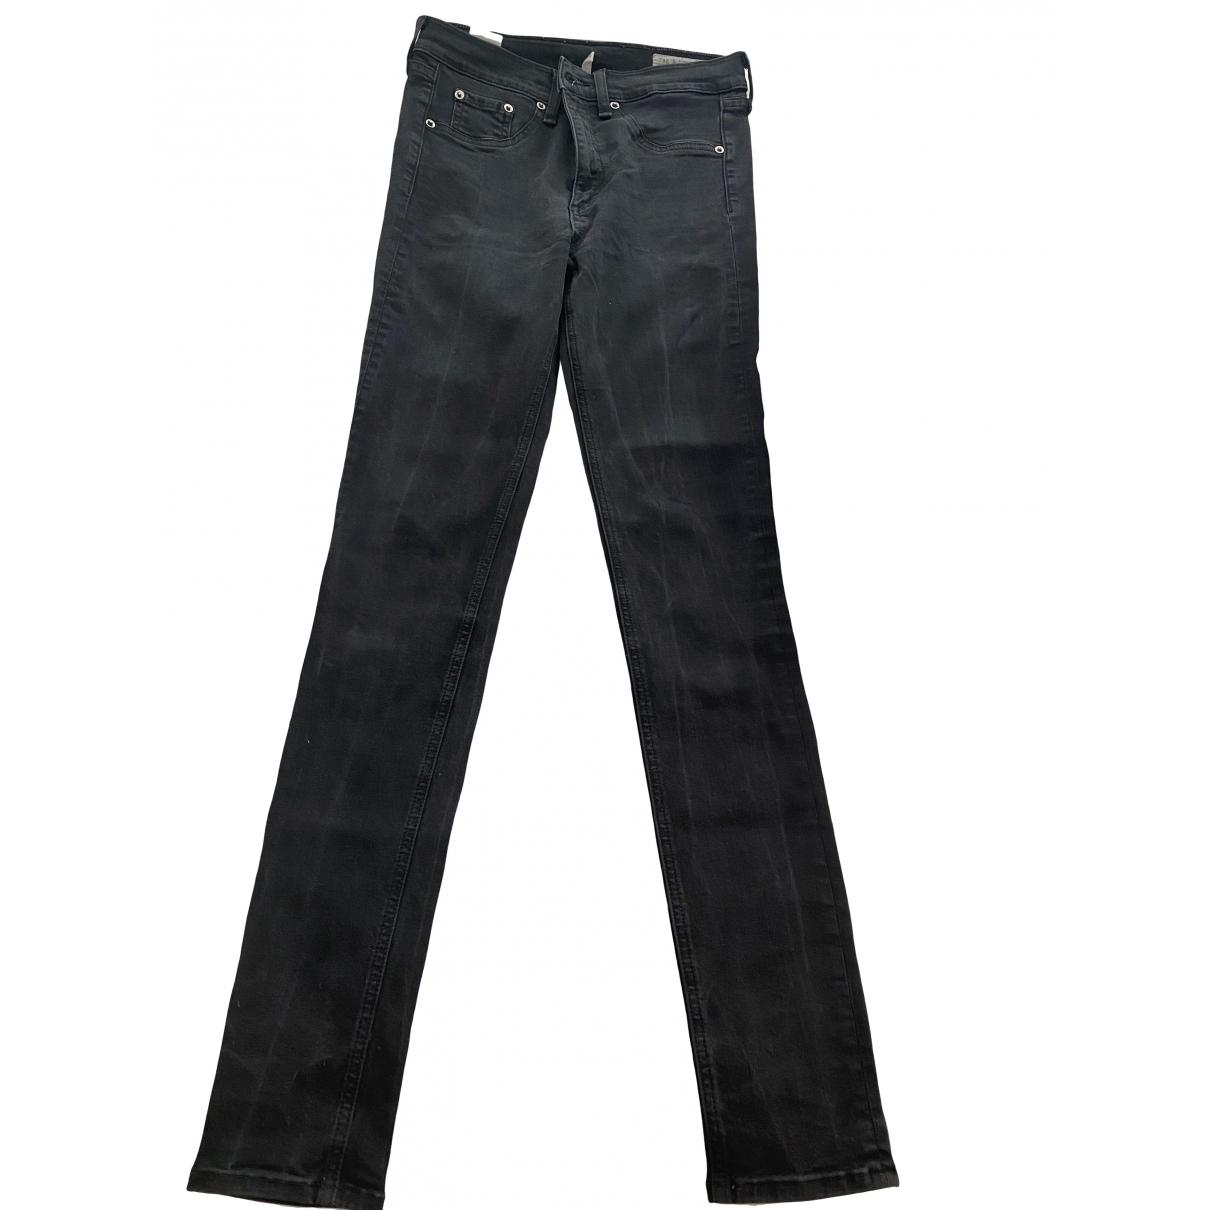 Rag & Bone \N Black Denim - Jeans Jeans for Women 28 US